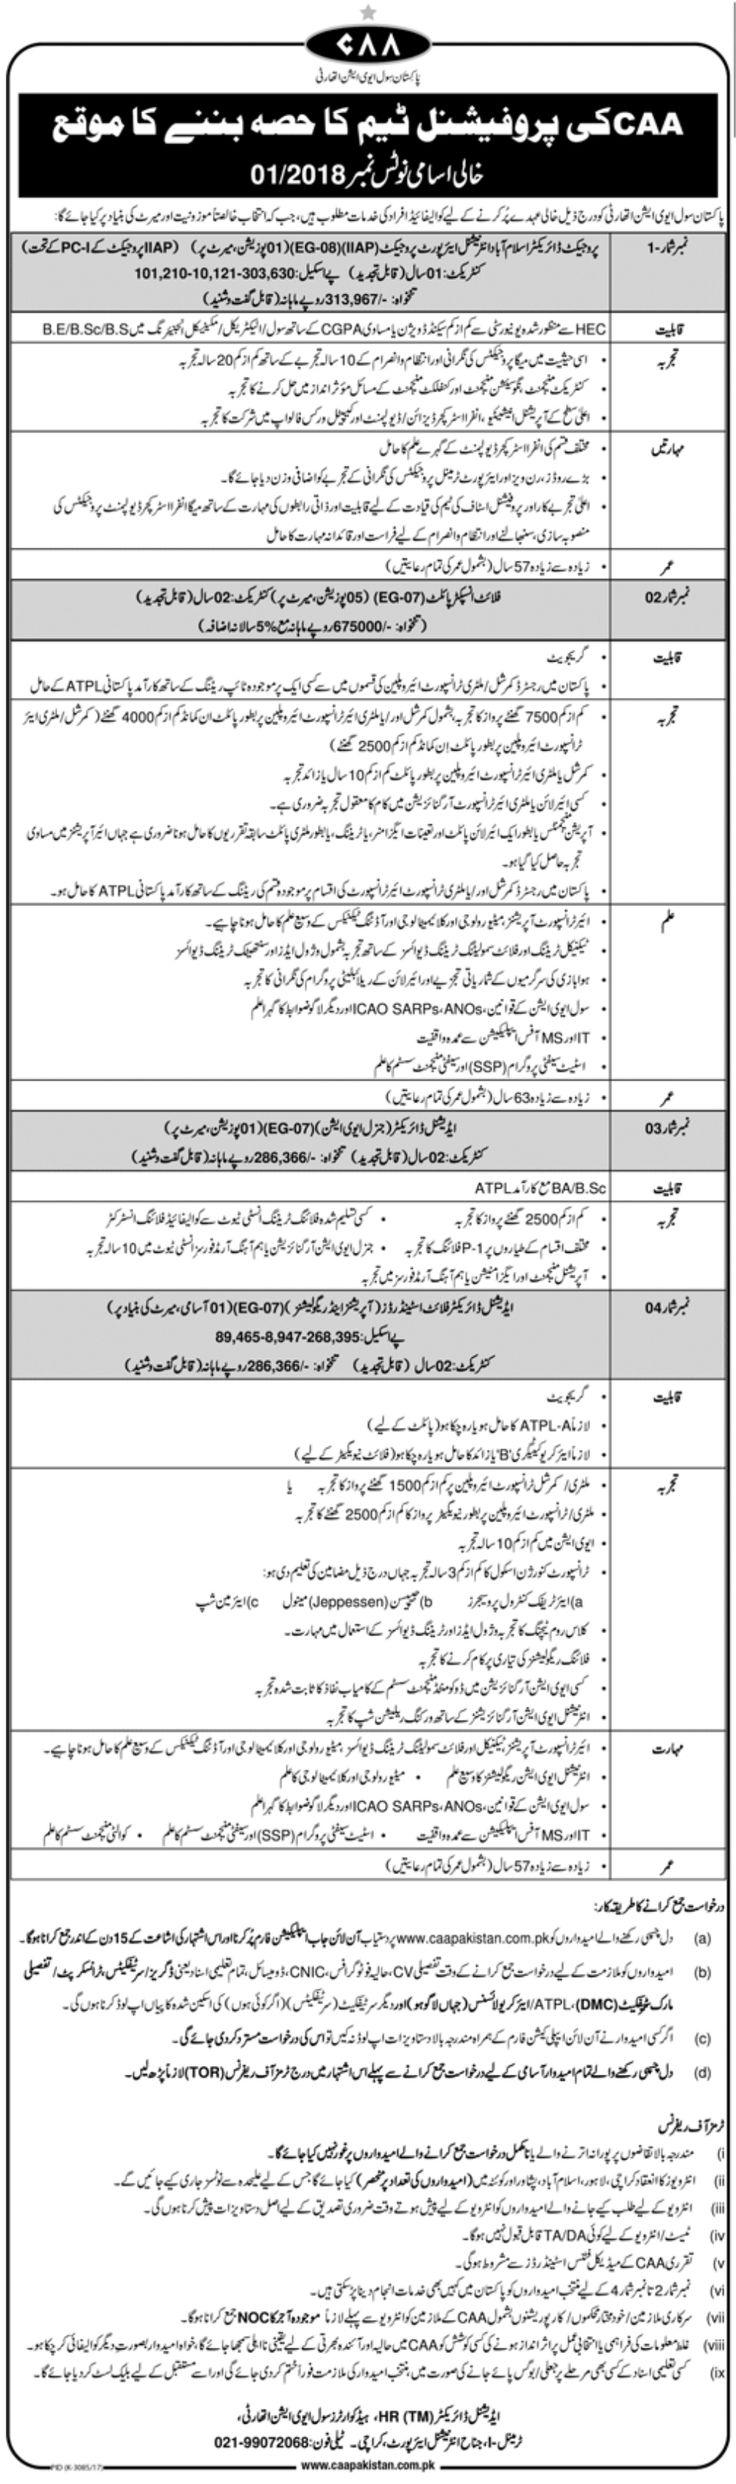 Pakistan Civil Aviation Authority CAA Jobs 2018 For Project Director, Flight Inspector & Additional Director